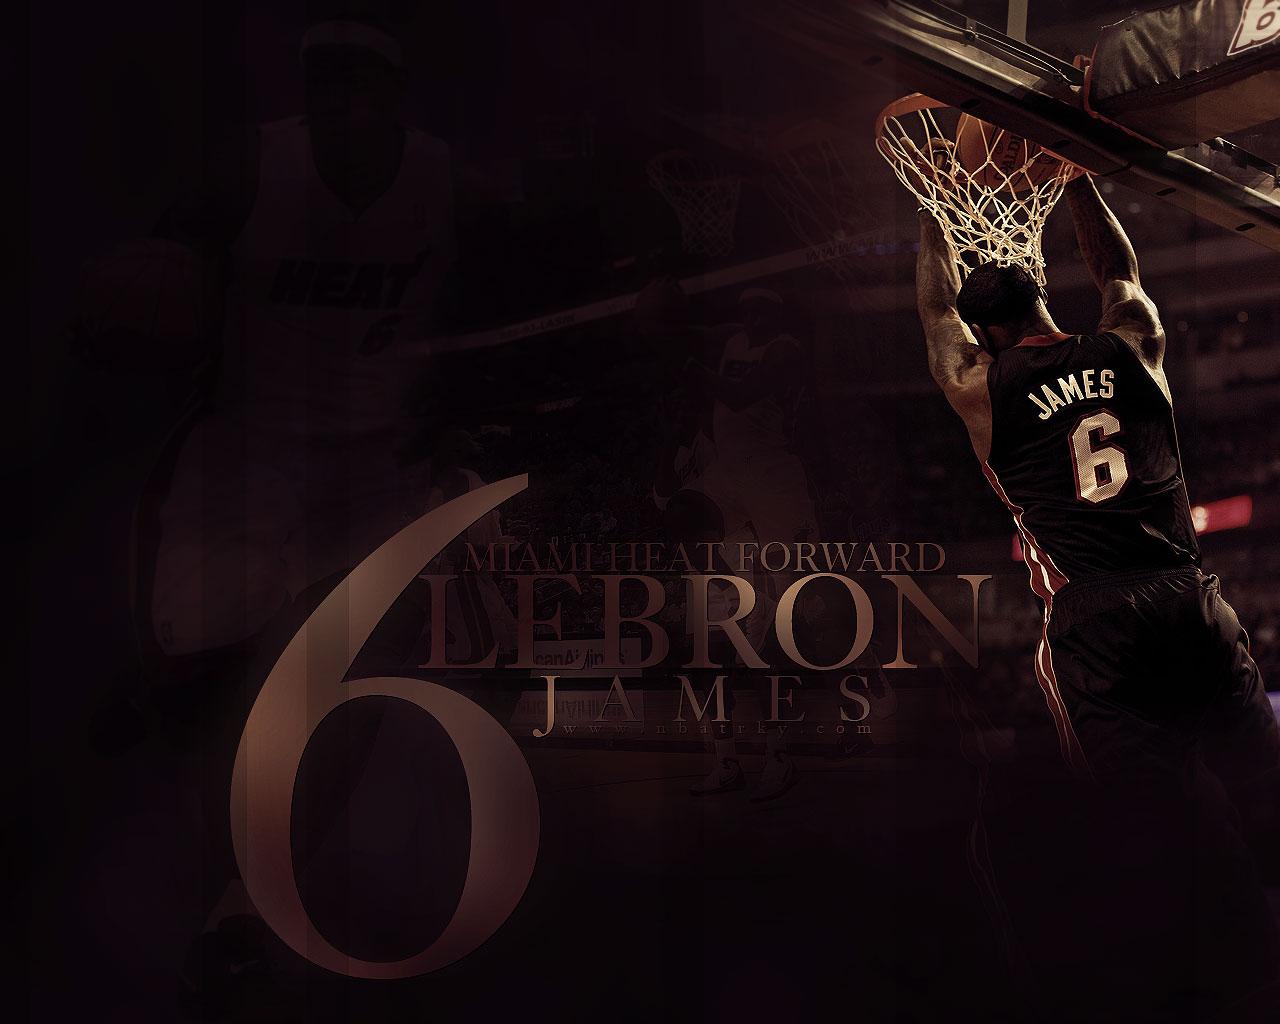 LeBron James Heat Reverse Dunk Widescreen Wallpaper Big Fan of NBA 1280x1024